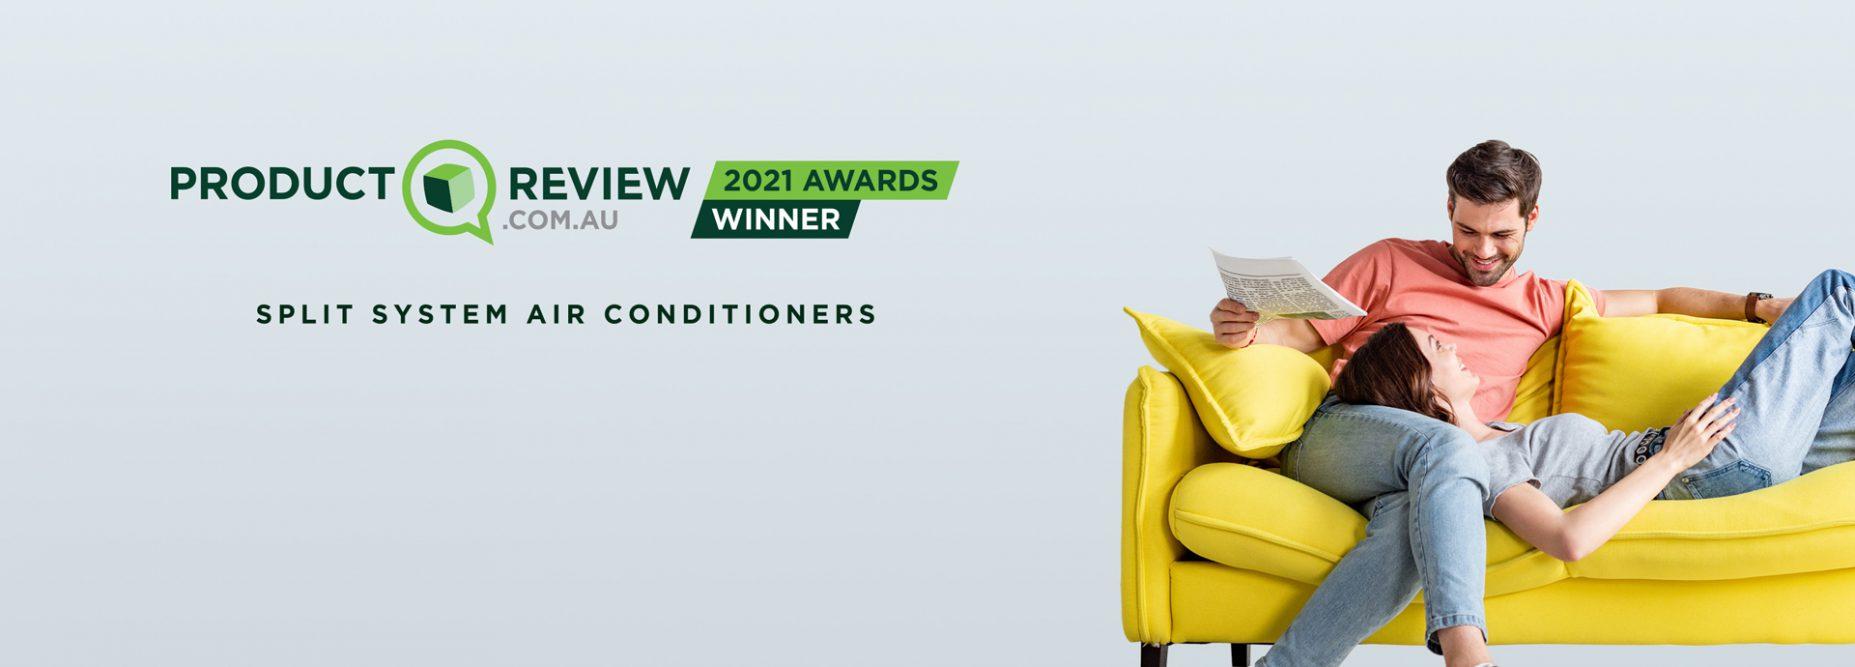 product review awards for split systems banner desktop